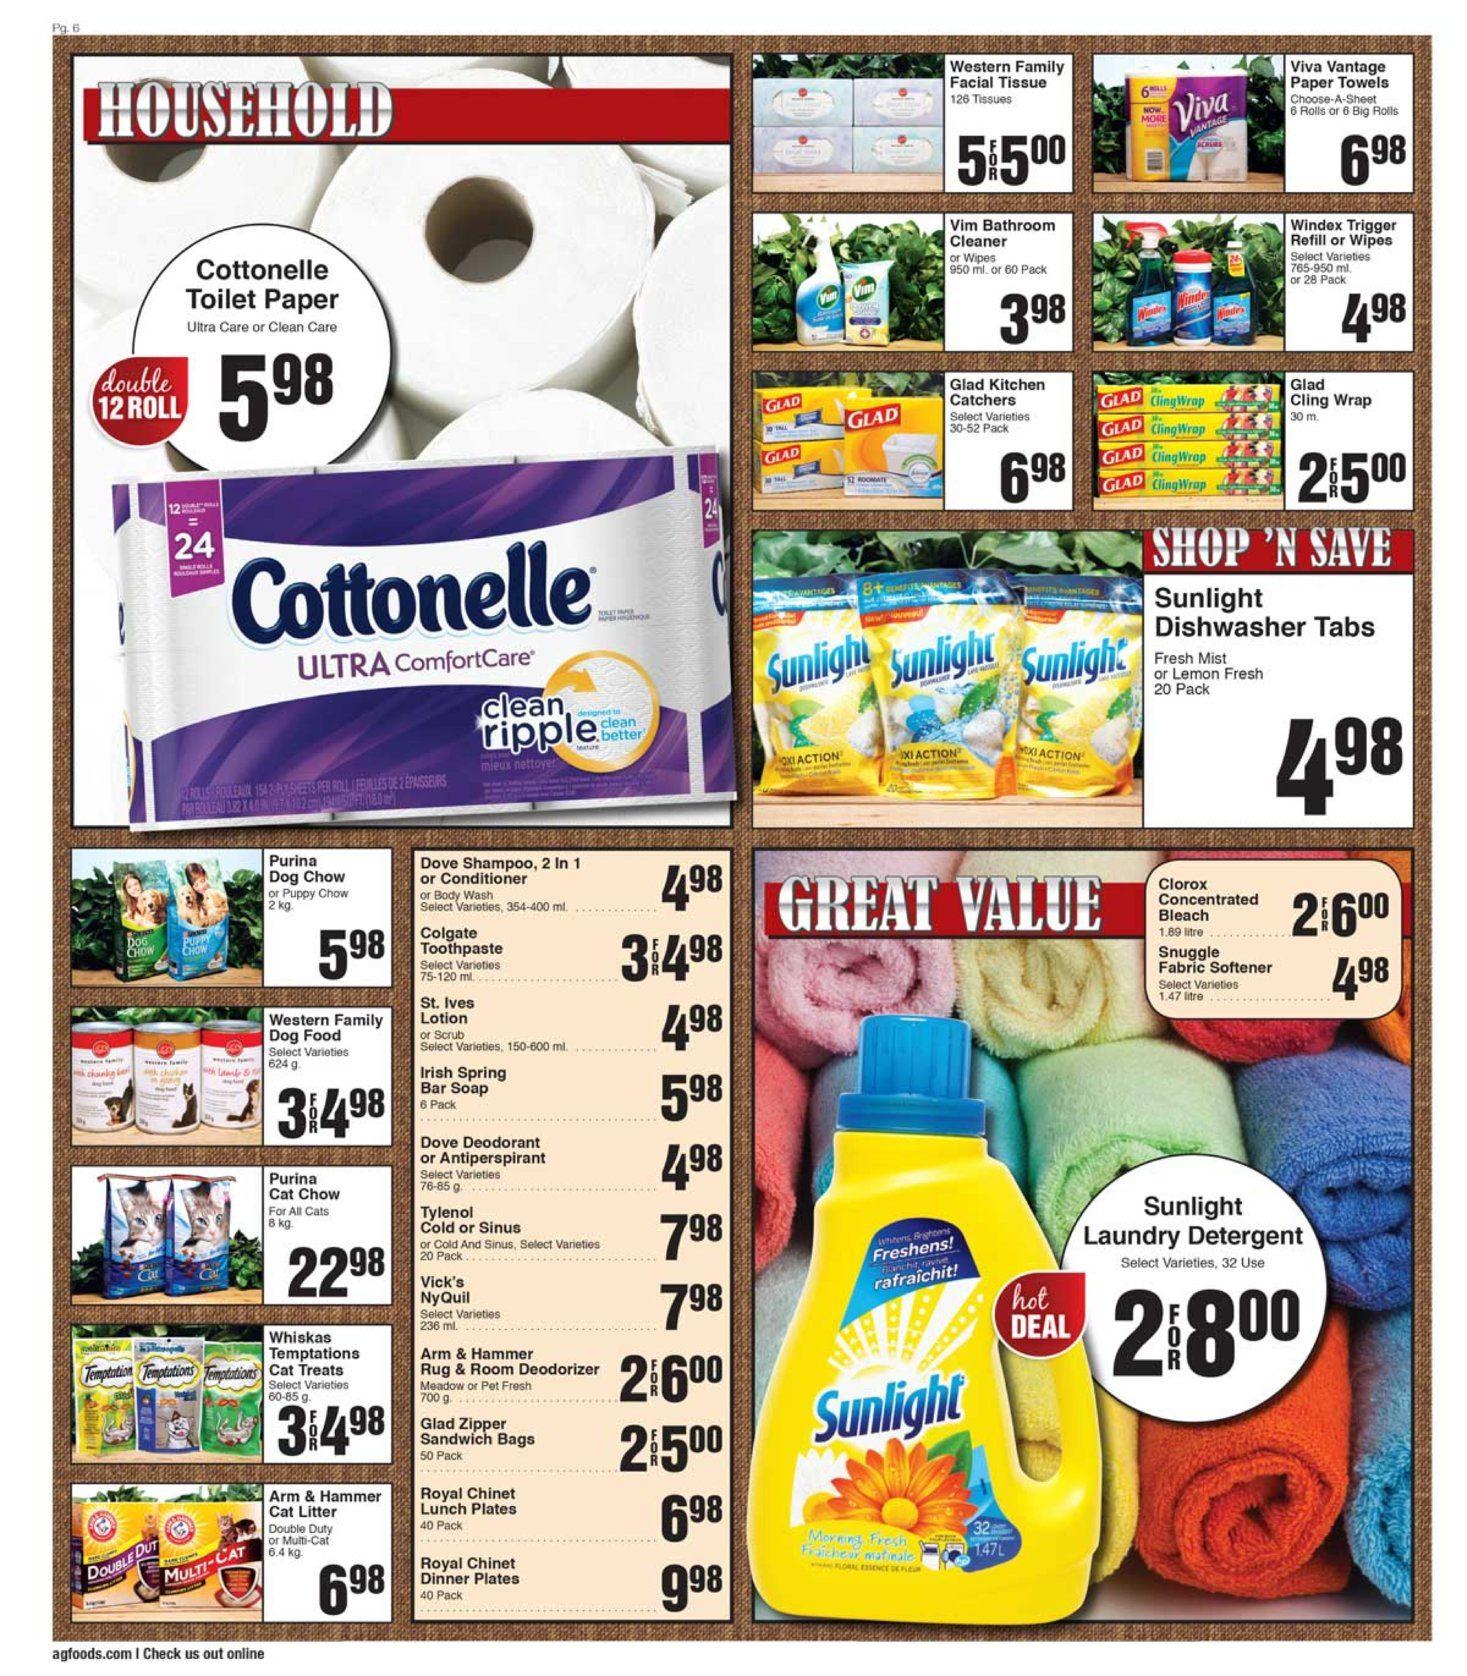 AG Foods Weekly Flyer - Weekly Specials - Jan 13 – 19